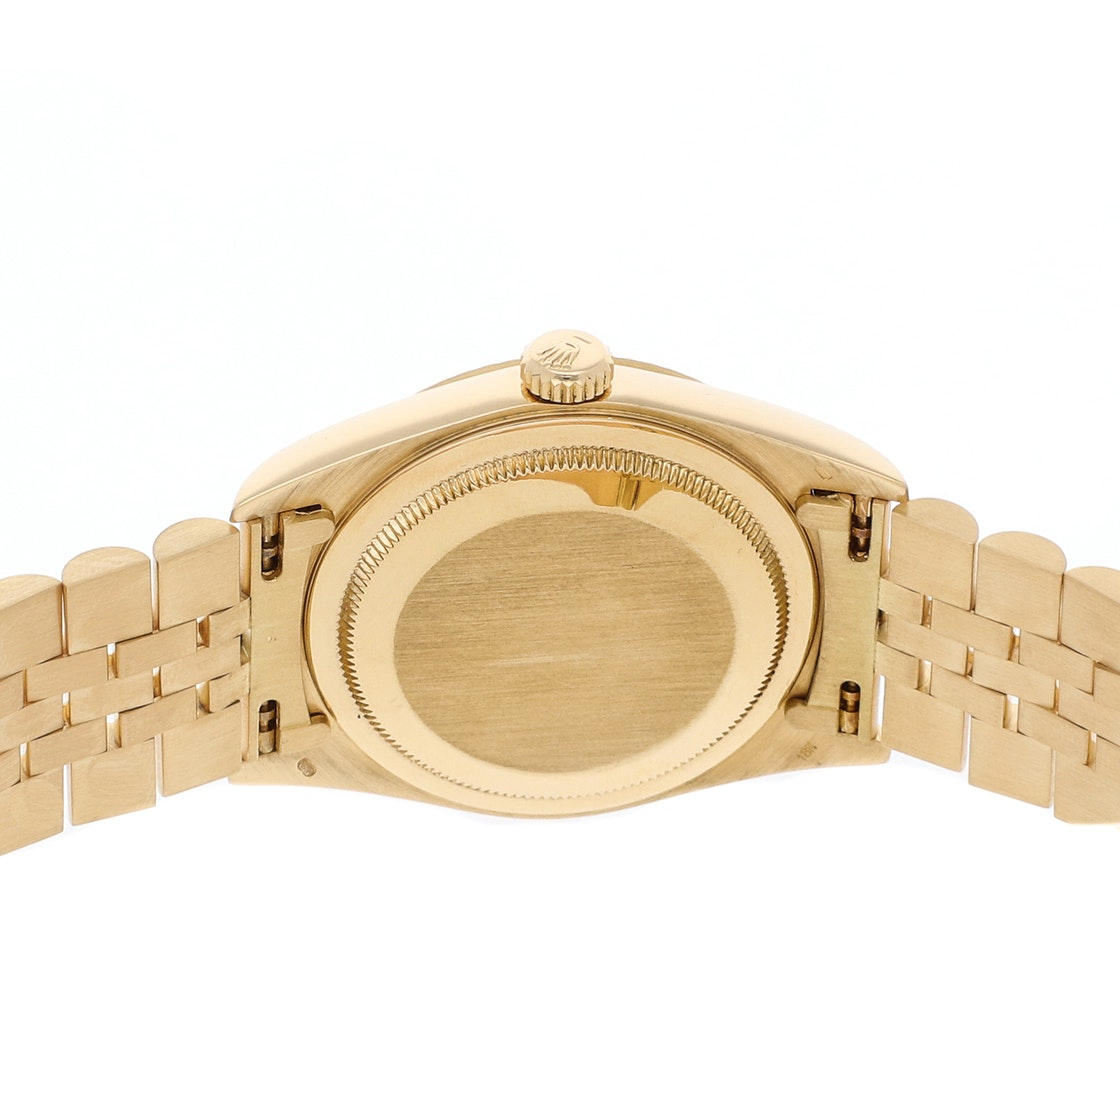 Rolex Datejust 16238